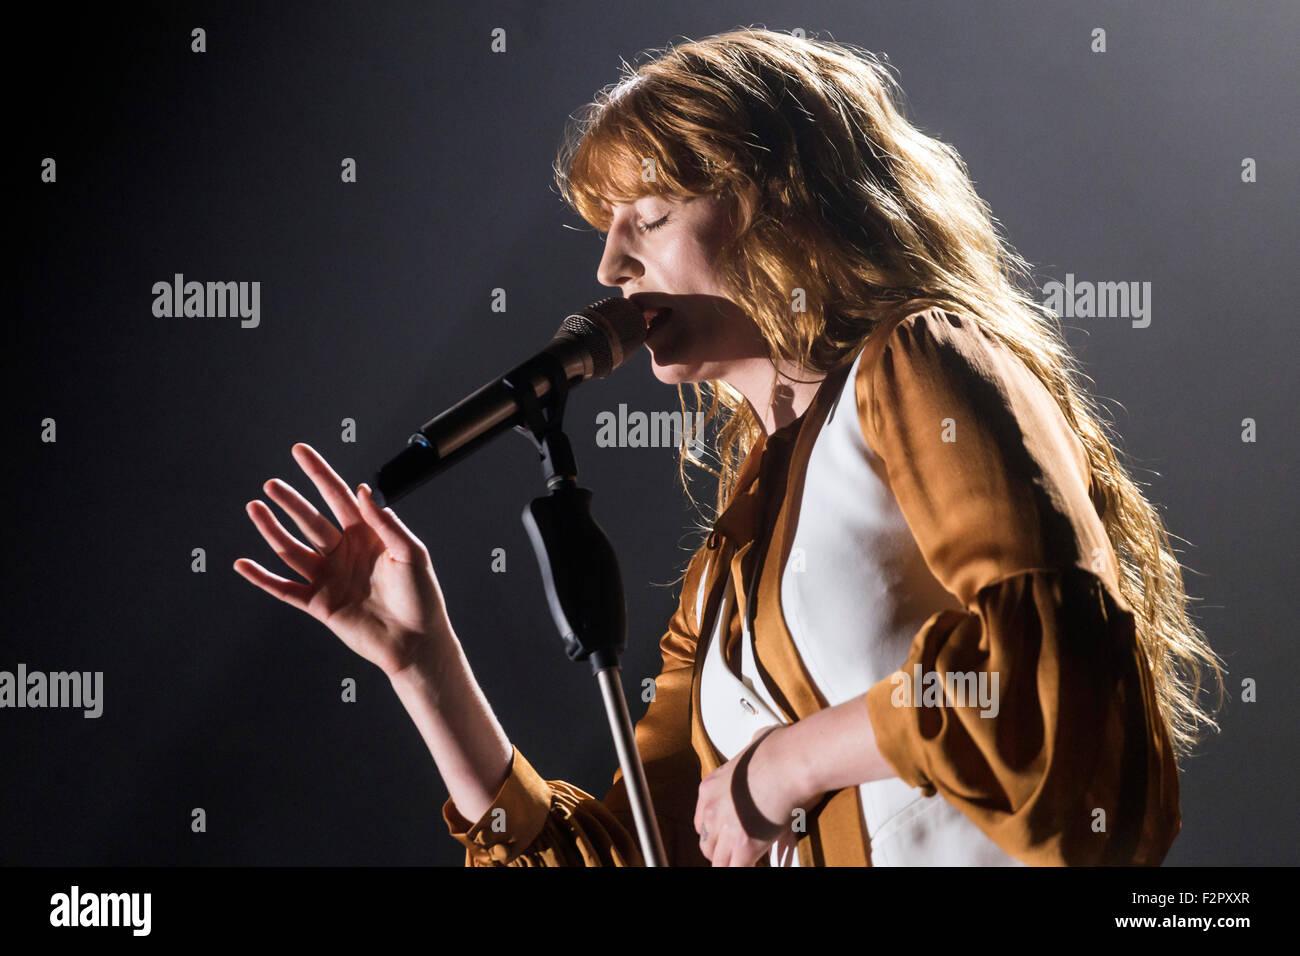 Florence and the Machine - Live Performance - Alexandra Palace - London Stock Photo